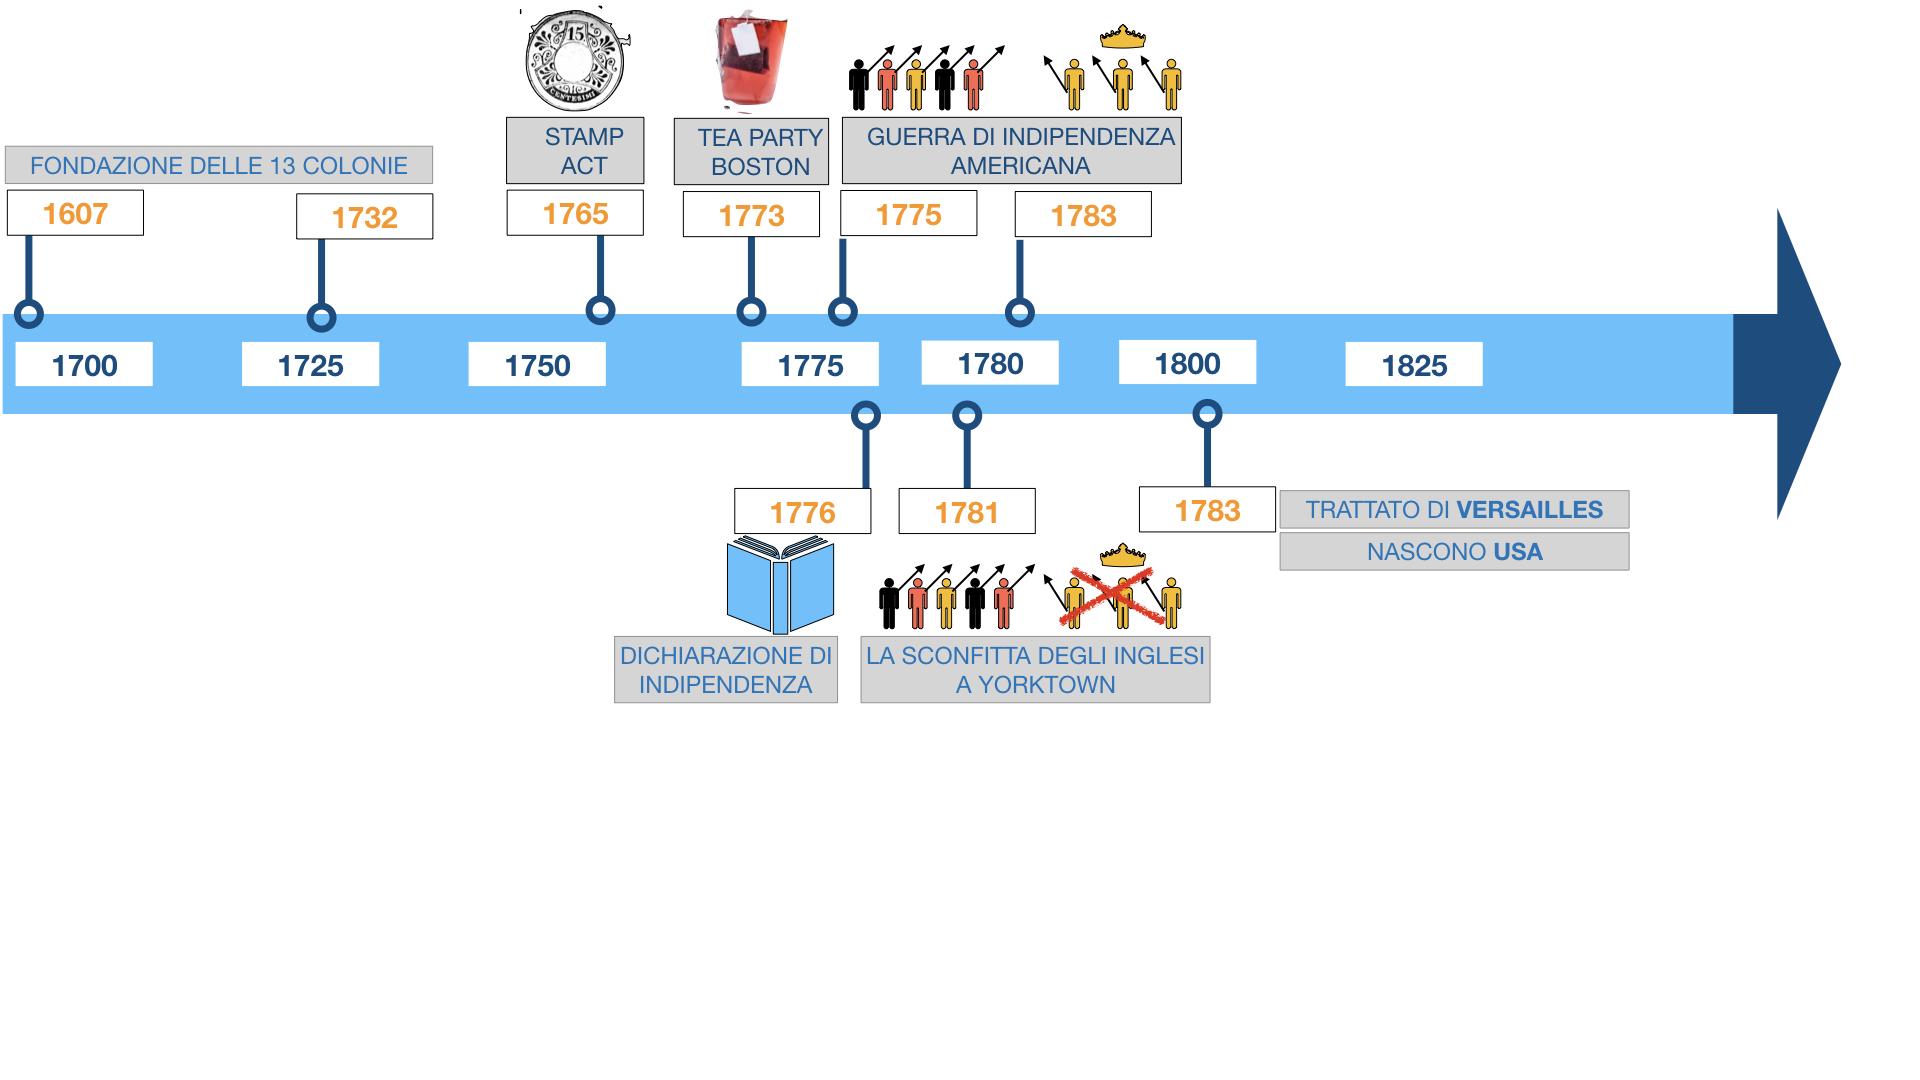 GUERRA DI INDIPENDENZA AMERICANA_SIMULAZIONE.155